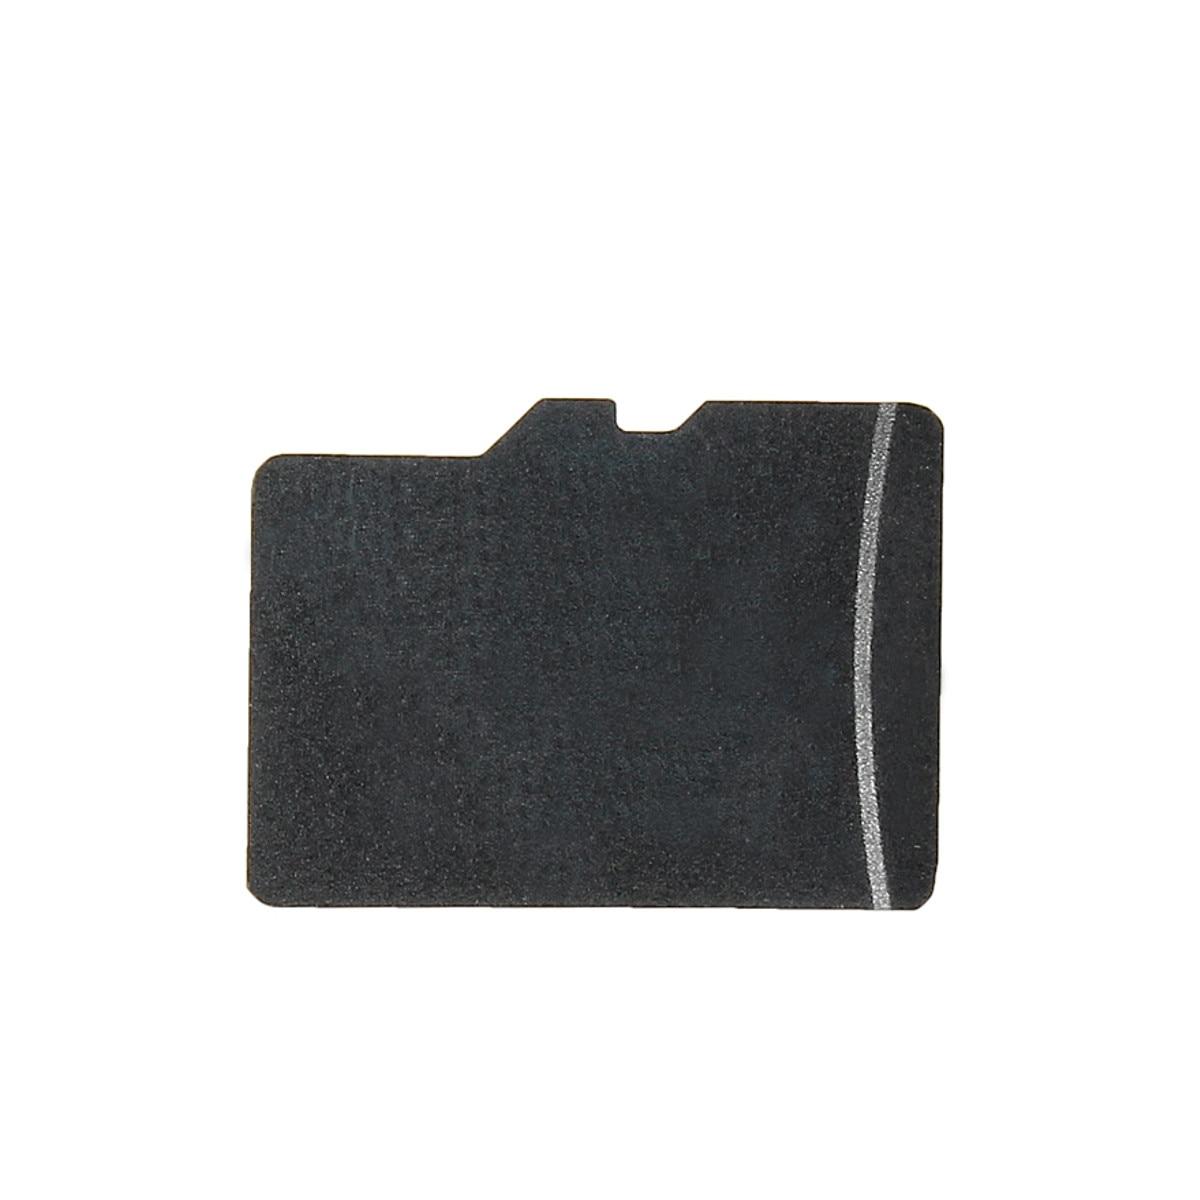 16GB Micro SD TF Card Secure Digital High Speed Flash Mini Memory Card Class 6 Internal Storage for Computer